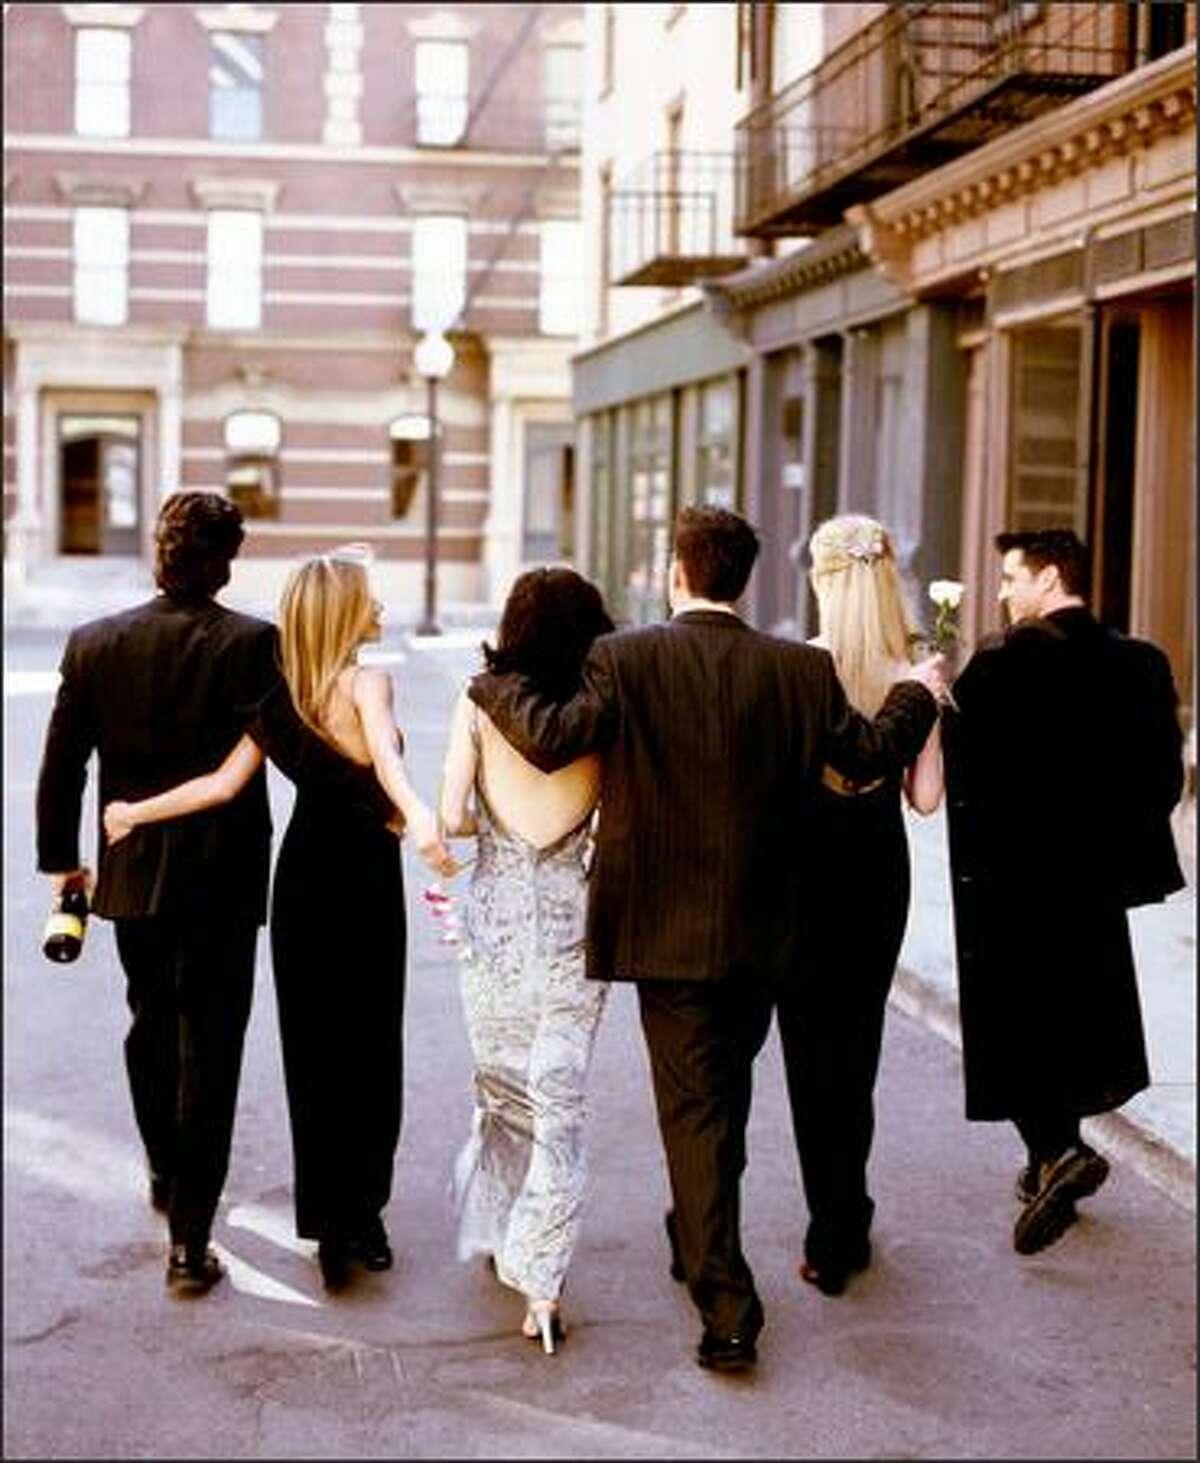 David Schwimmer as Ross Geller, Jennifer Aniston as Rachel Green, Courteney Cox Arquette as Monica Geller Bing, Matthew Perry as Chandler Bing, Lisa Kudrow as Phoebe Buffay, Matt Le Blanc as Joey Tribbiani (Warner Bros. Photo)